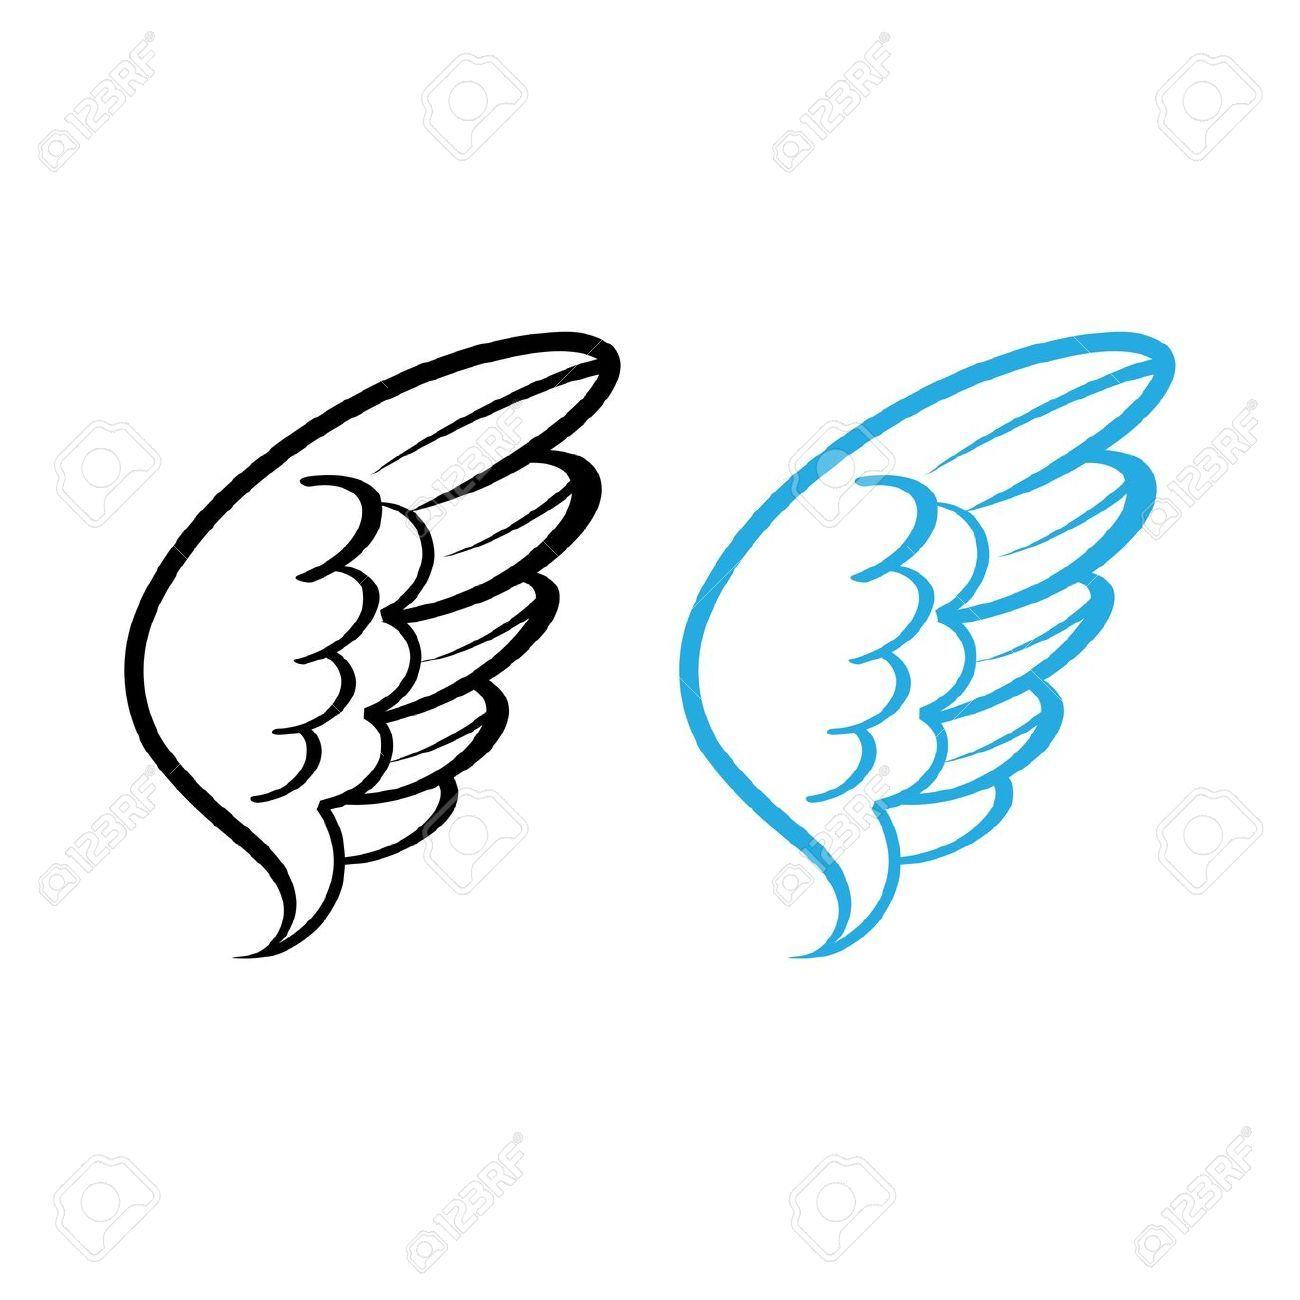 simple illustration of angels.